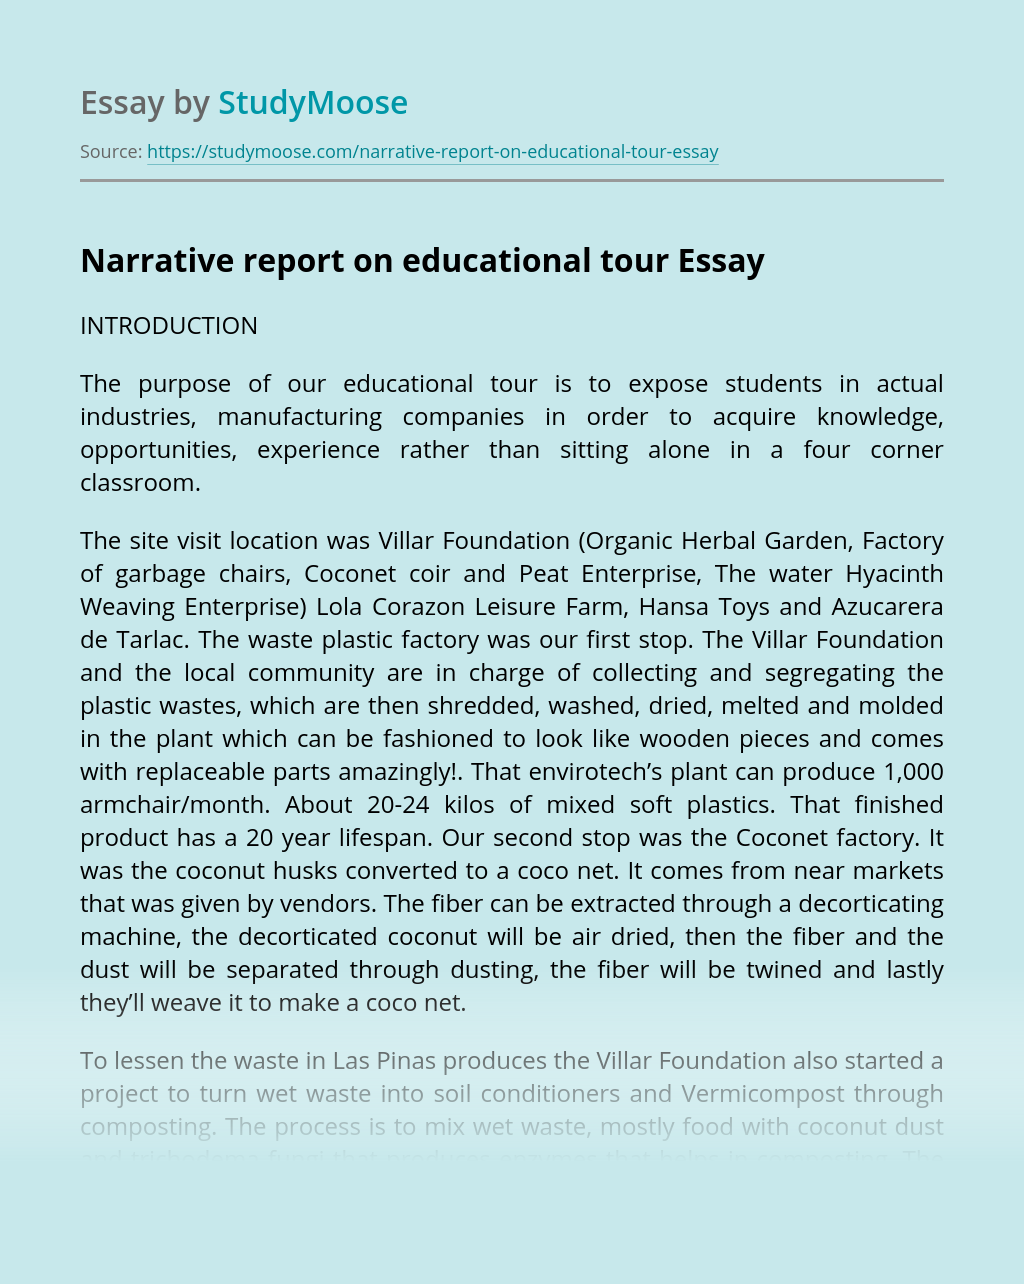 Narrative report on educational tour